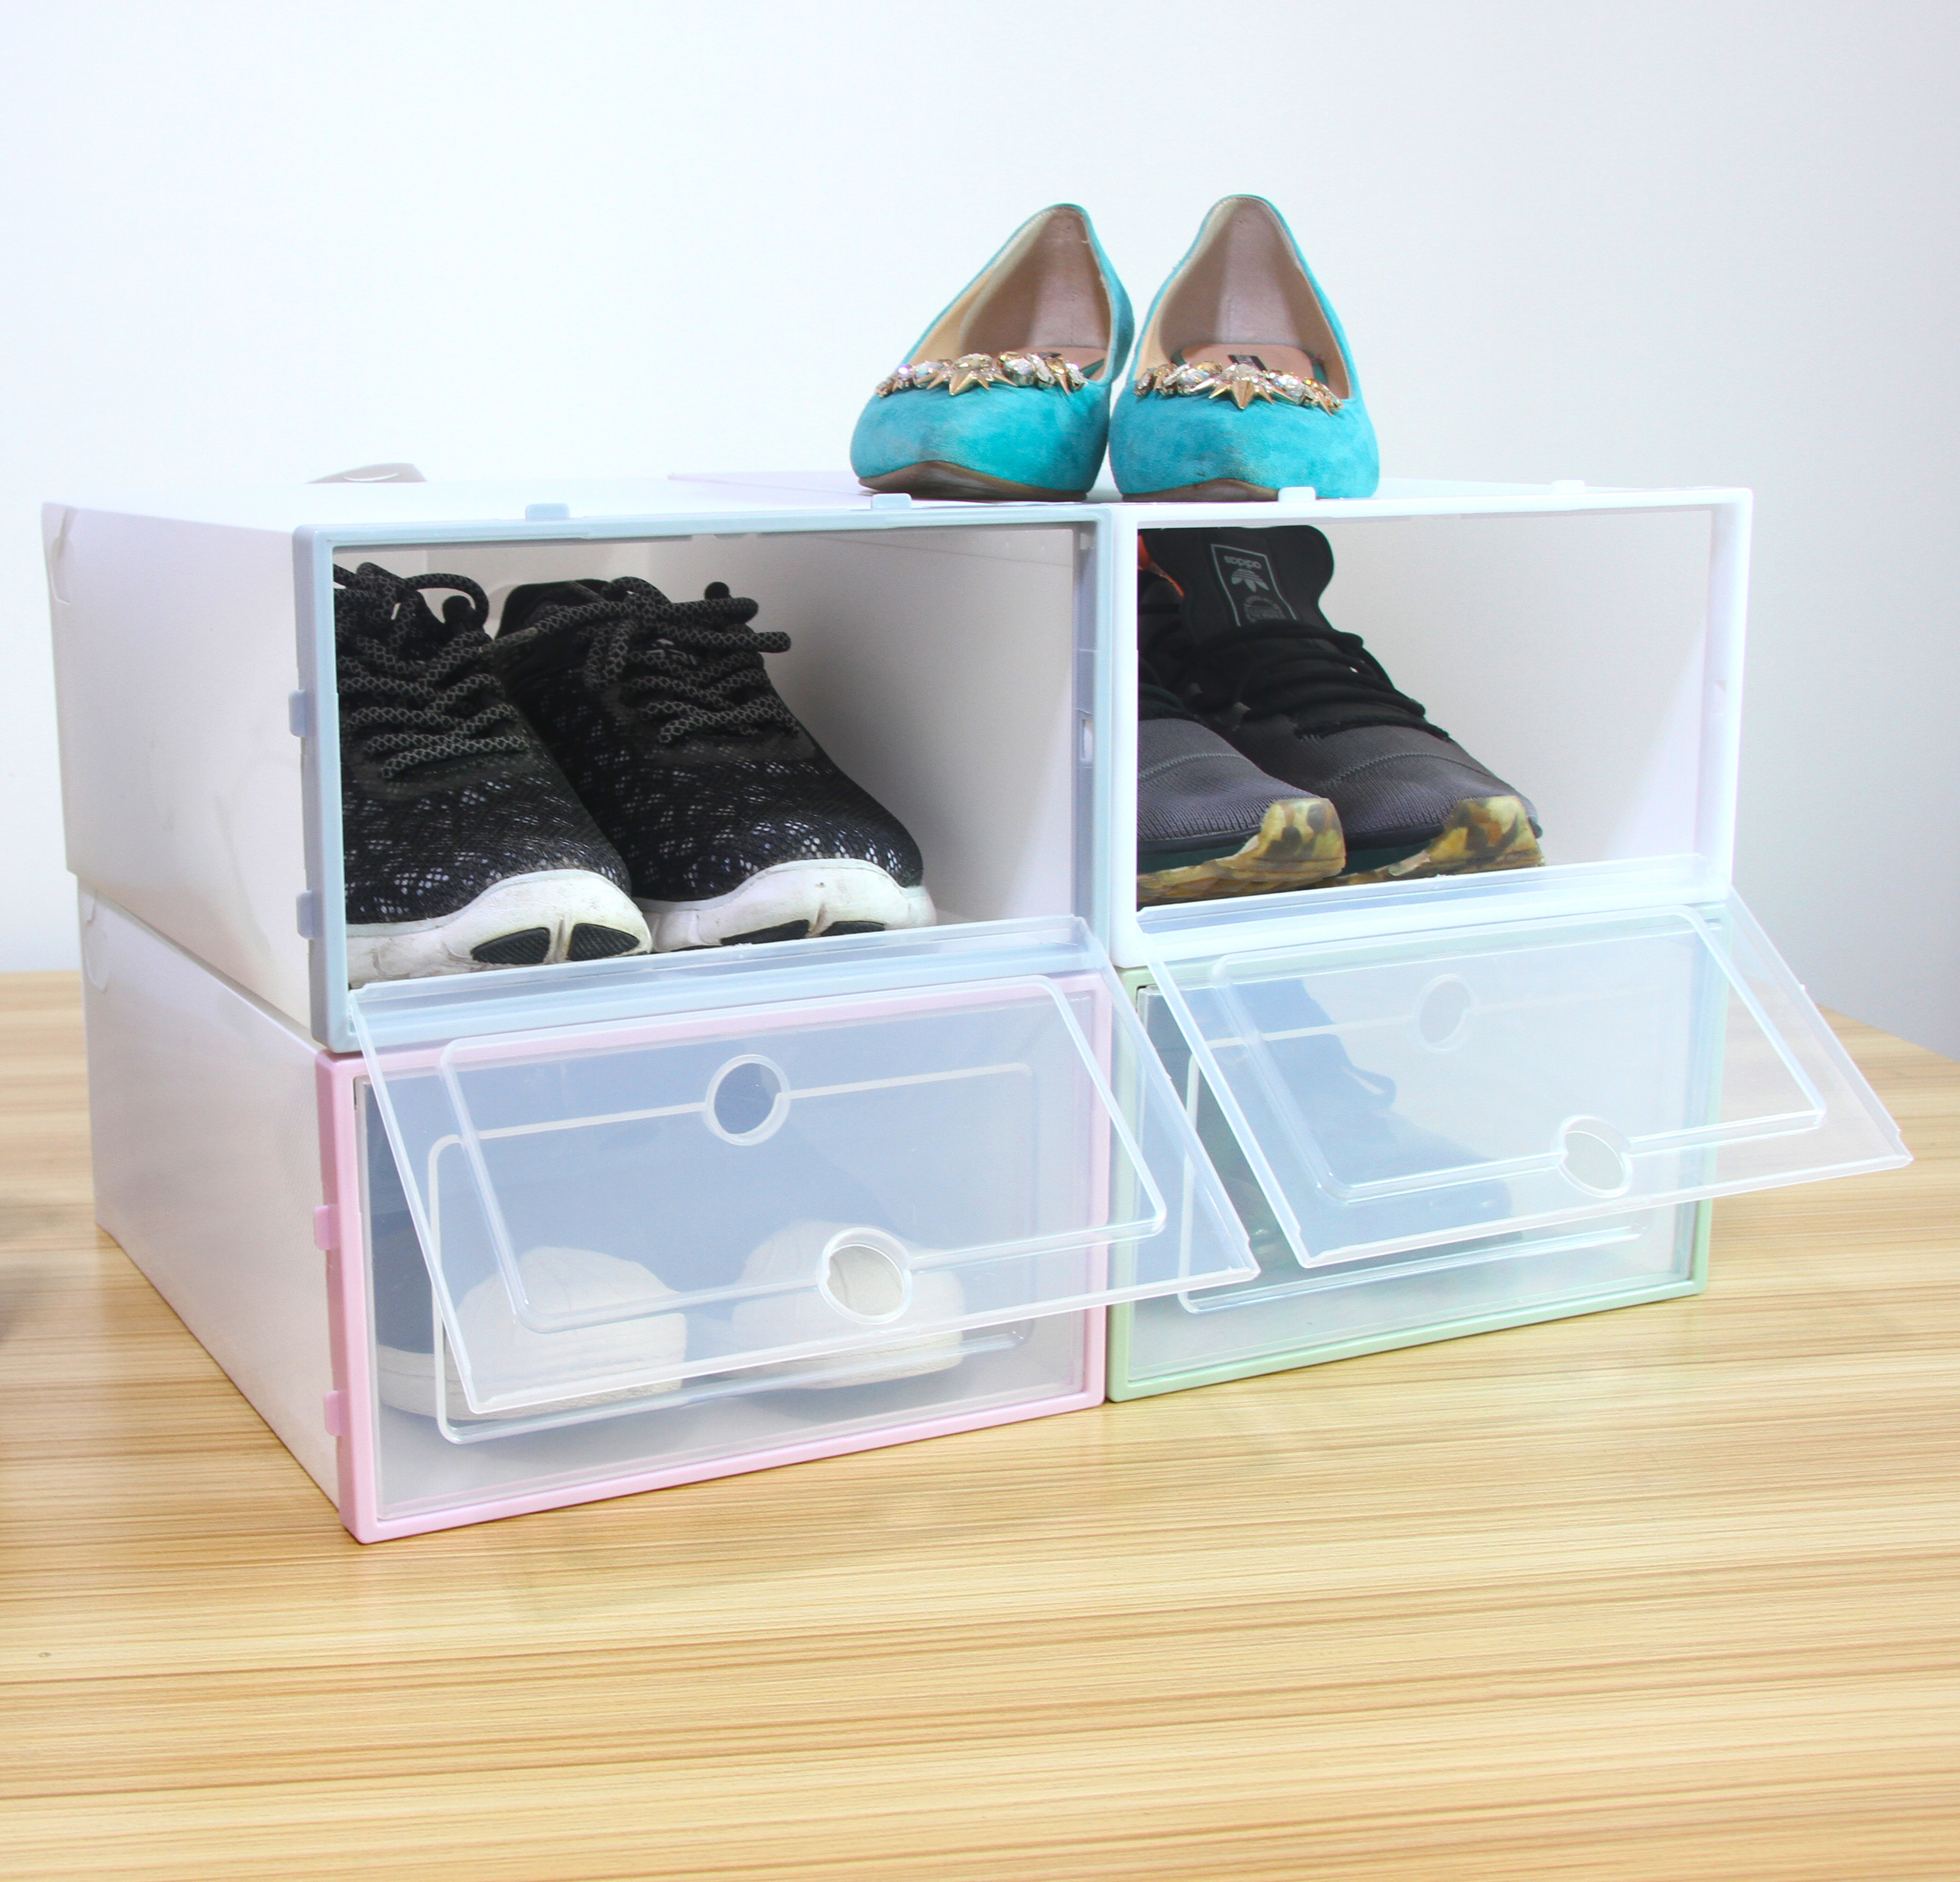 DIY Klapp Schuhkarton Clamshell Schuhe Aufbewahrungsboxen